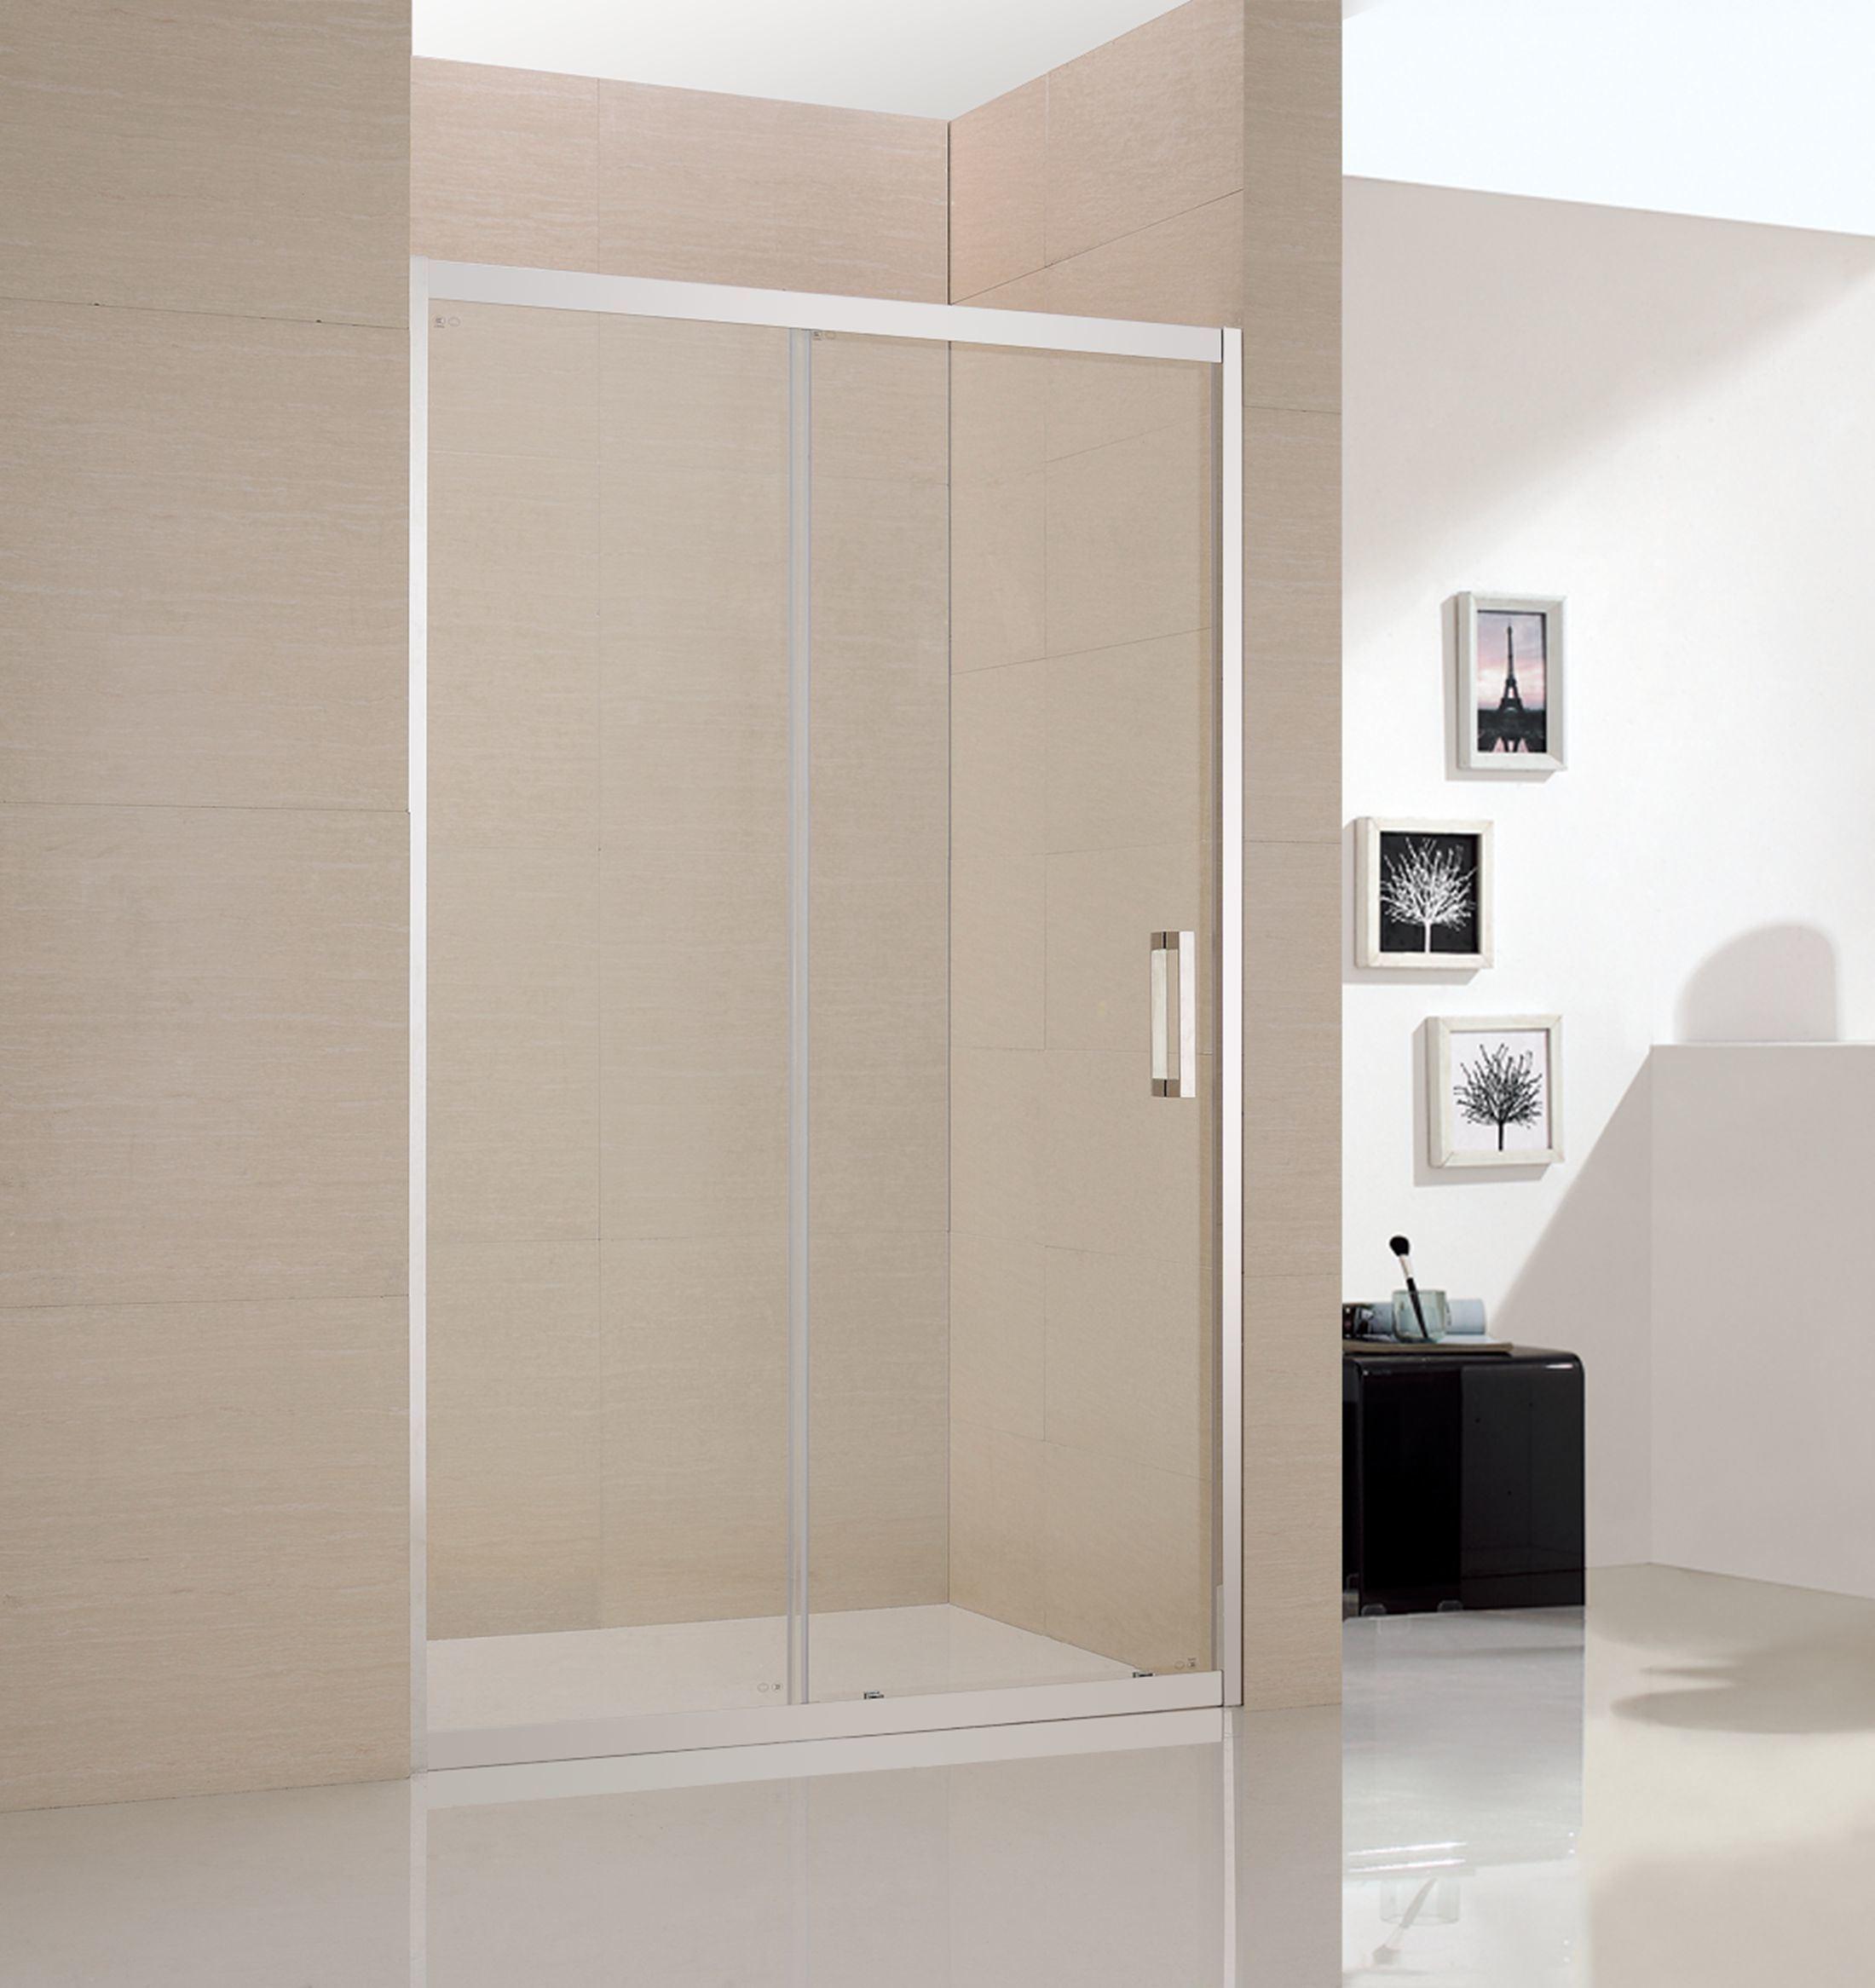 High-Tect Schiebetür Profil / Dusche Badezimmer / Dusche Kabinett ...